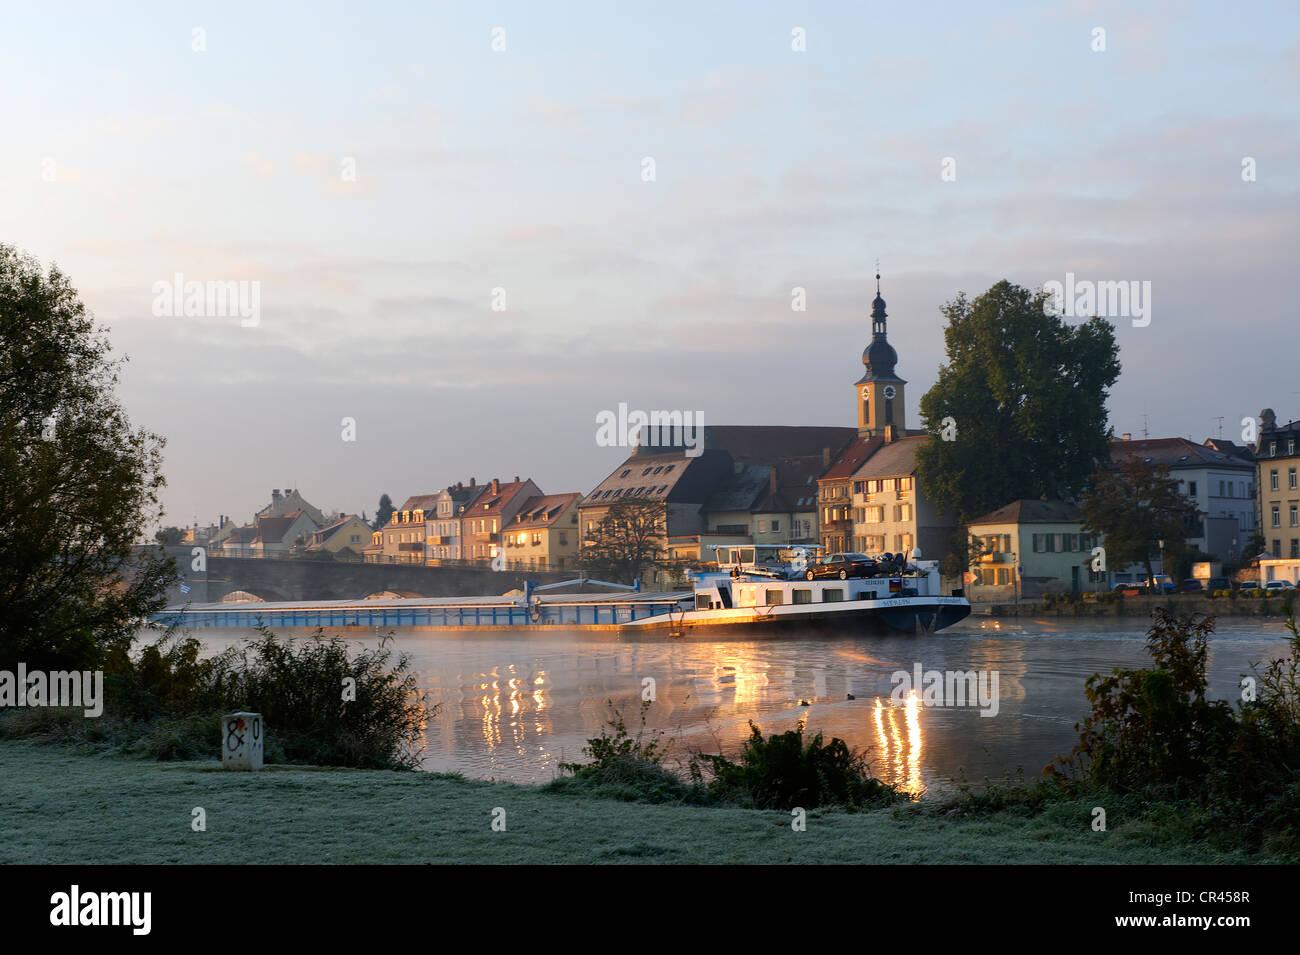 Banks of the Main river with the Catholic Church of St. John, Kitzingen, Lower Franconia, Franconia, Bavaria, Germany, - Stock Image